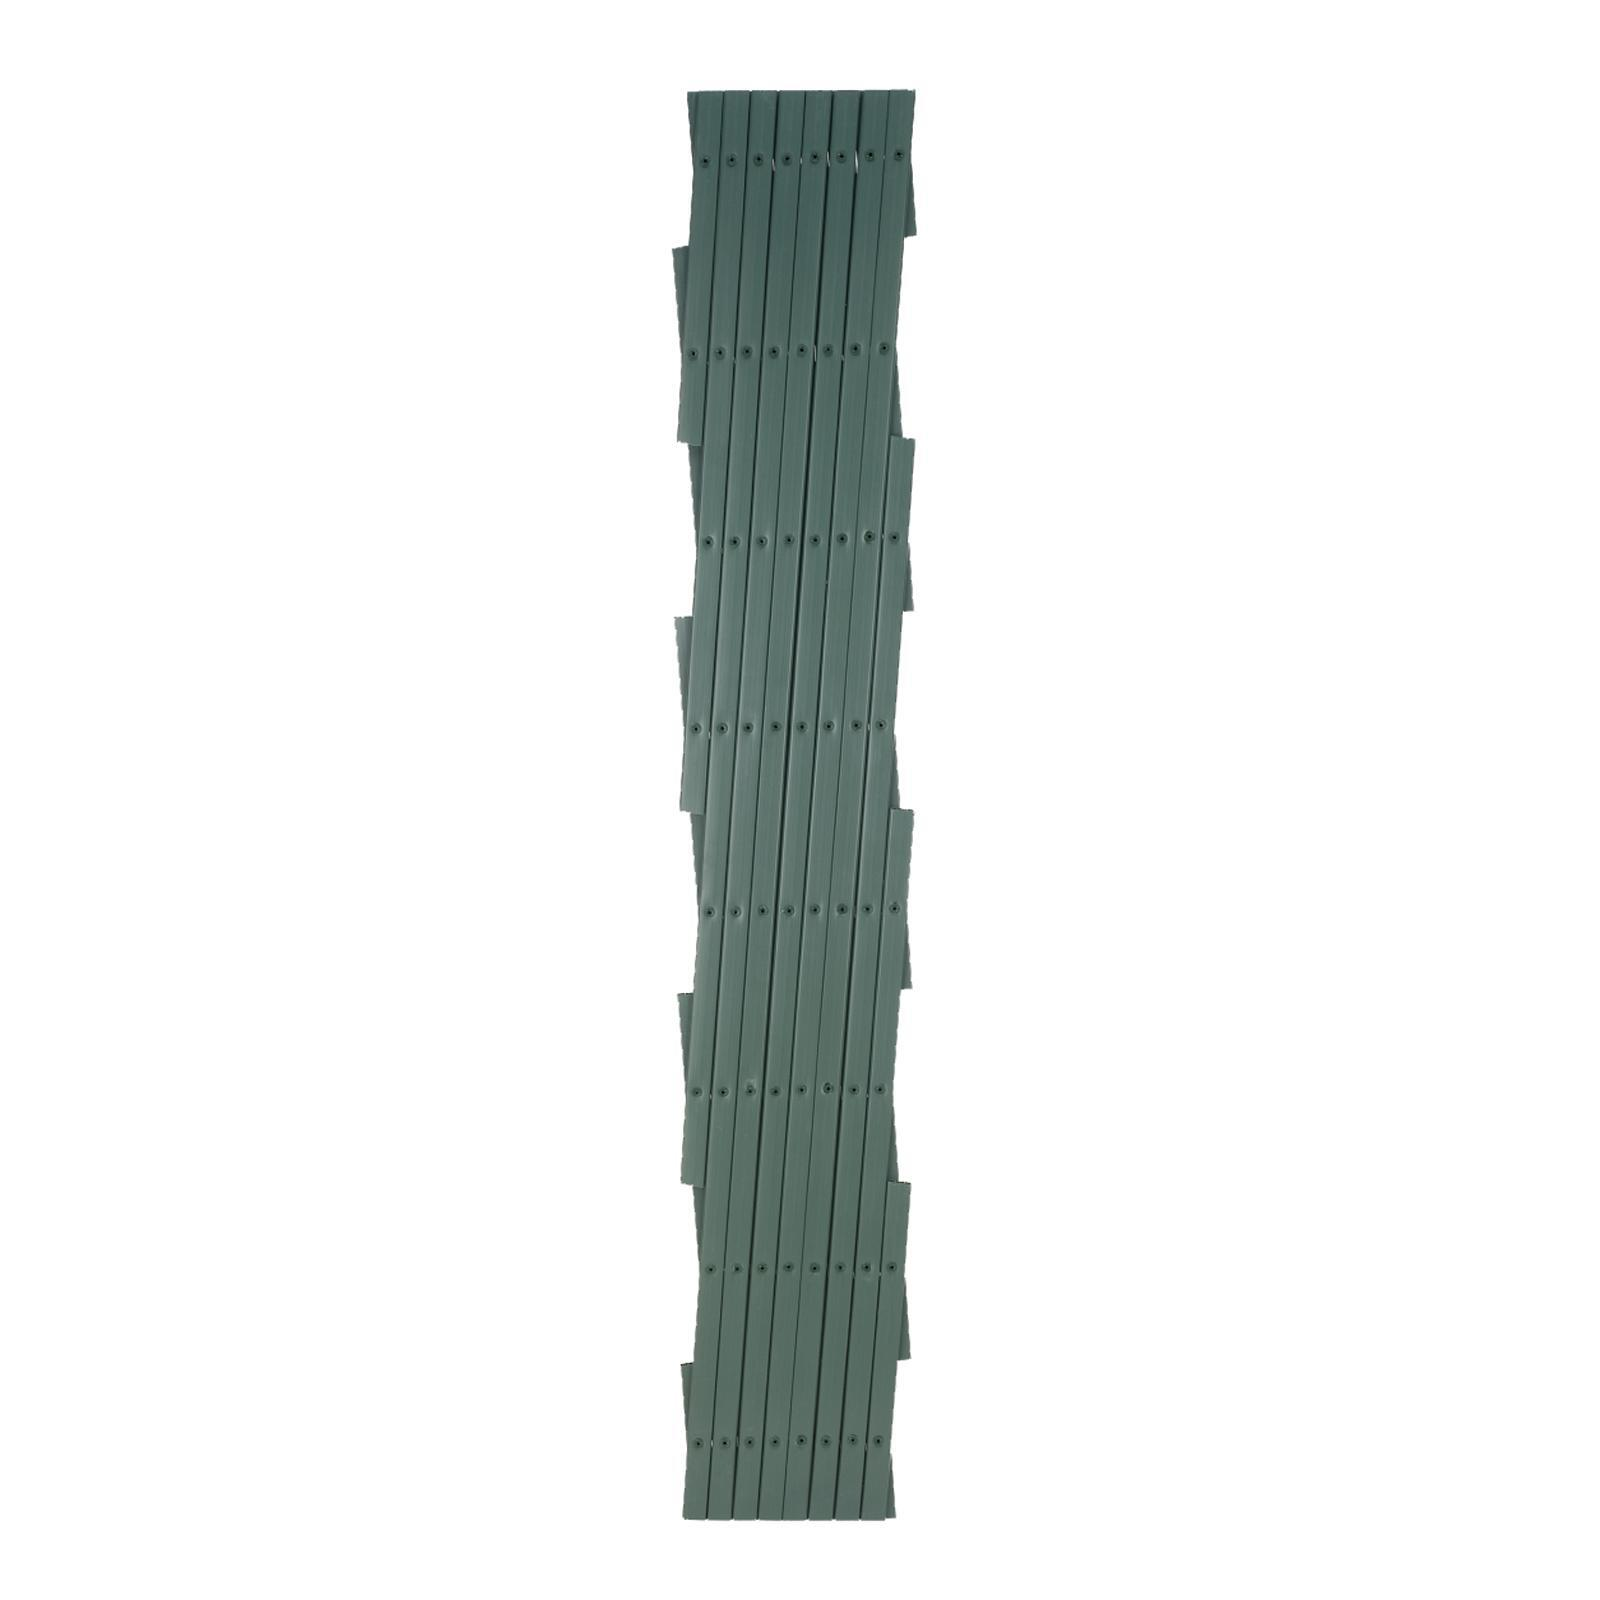 Traliccio estensibile Treplas in pvc L 100 x H 200 cm , spessore 7 mm - 2